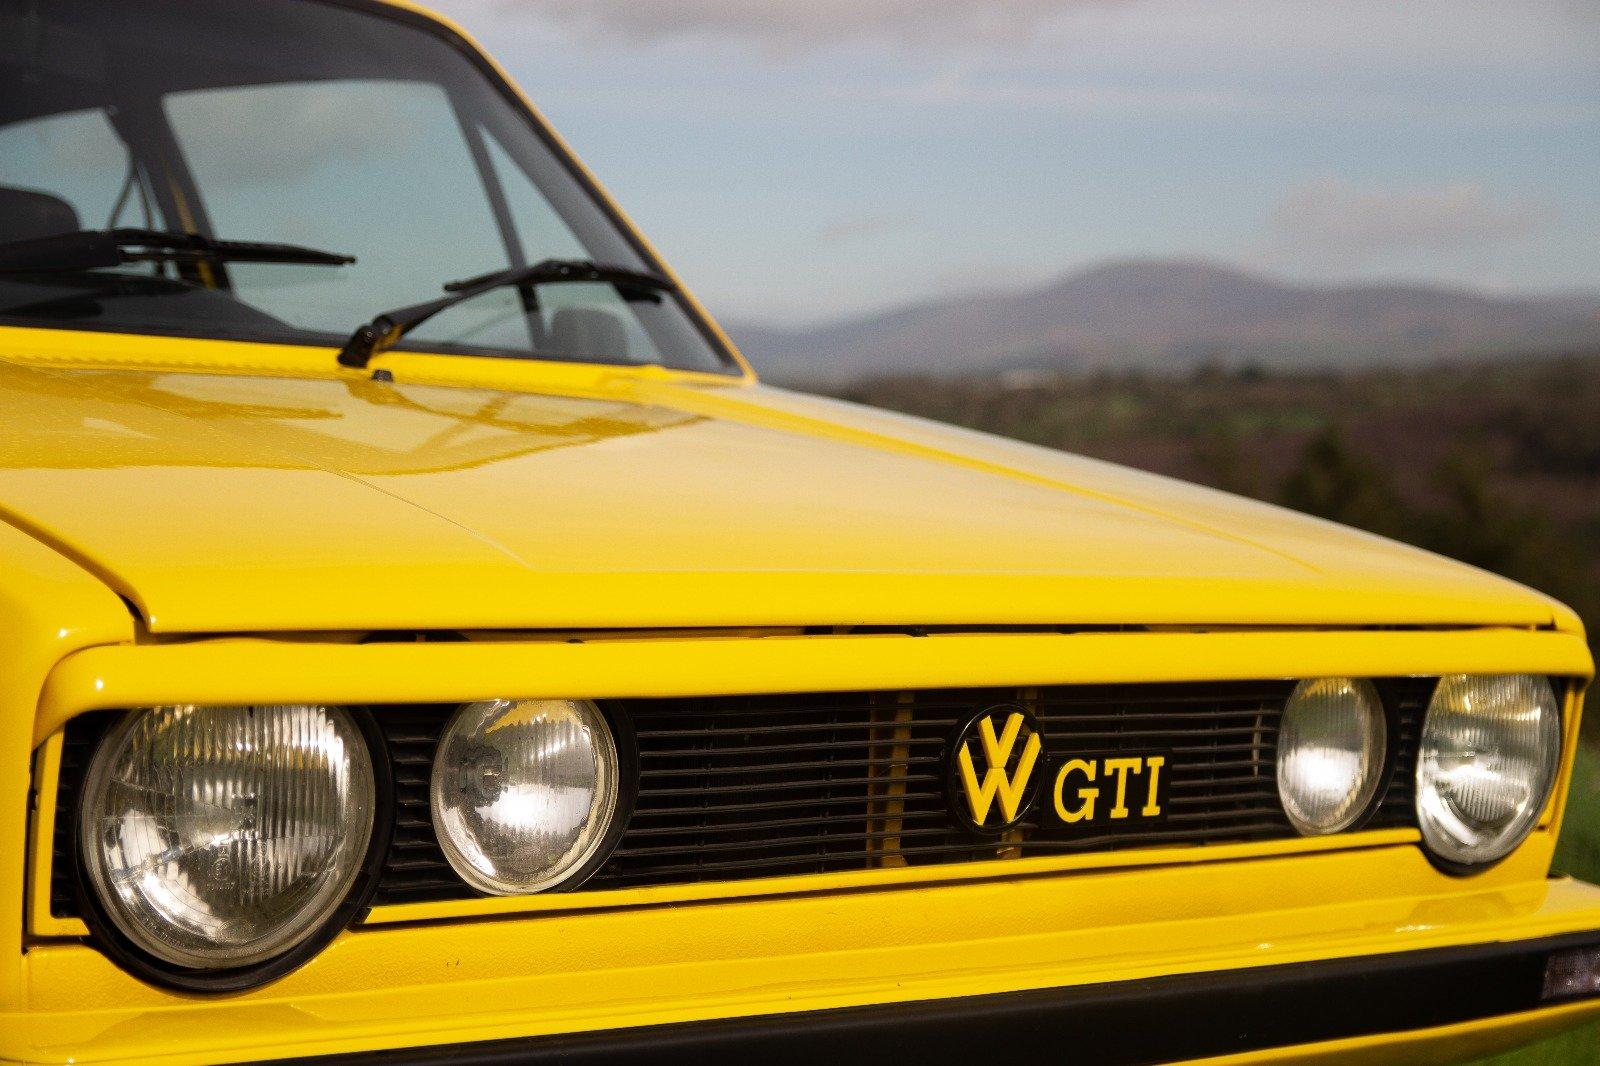 1982 Volkswagen Golf MK1 GTI Custom 130 BHP For Sale (picture 5 of 6)